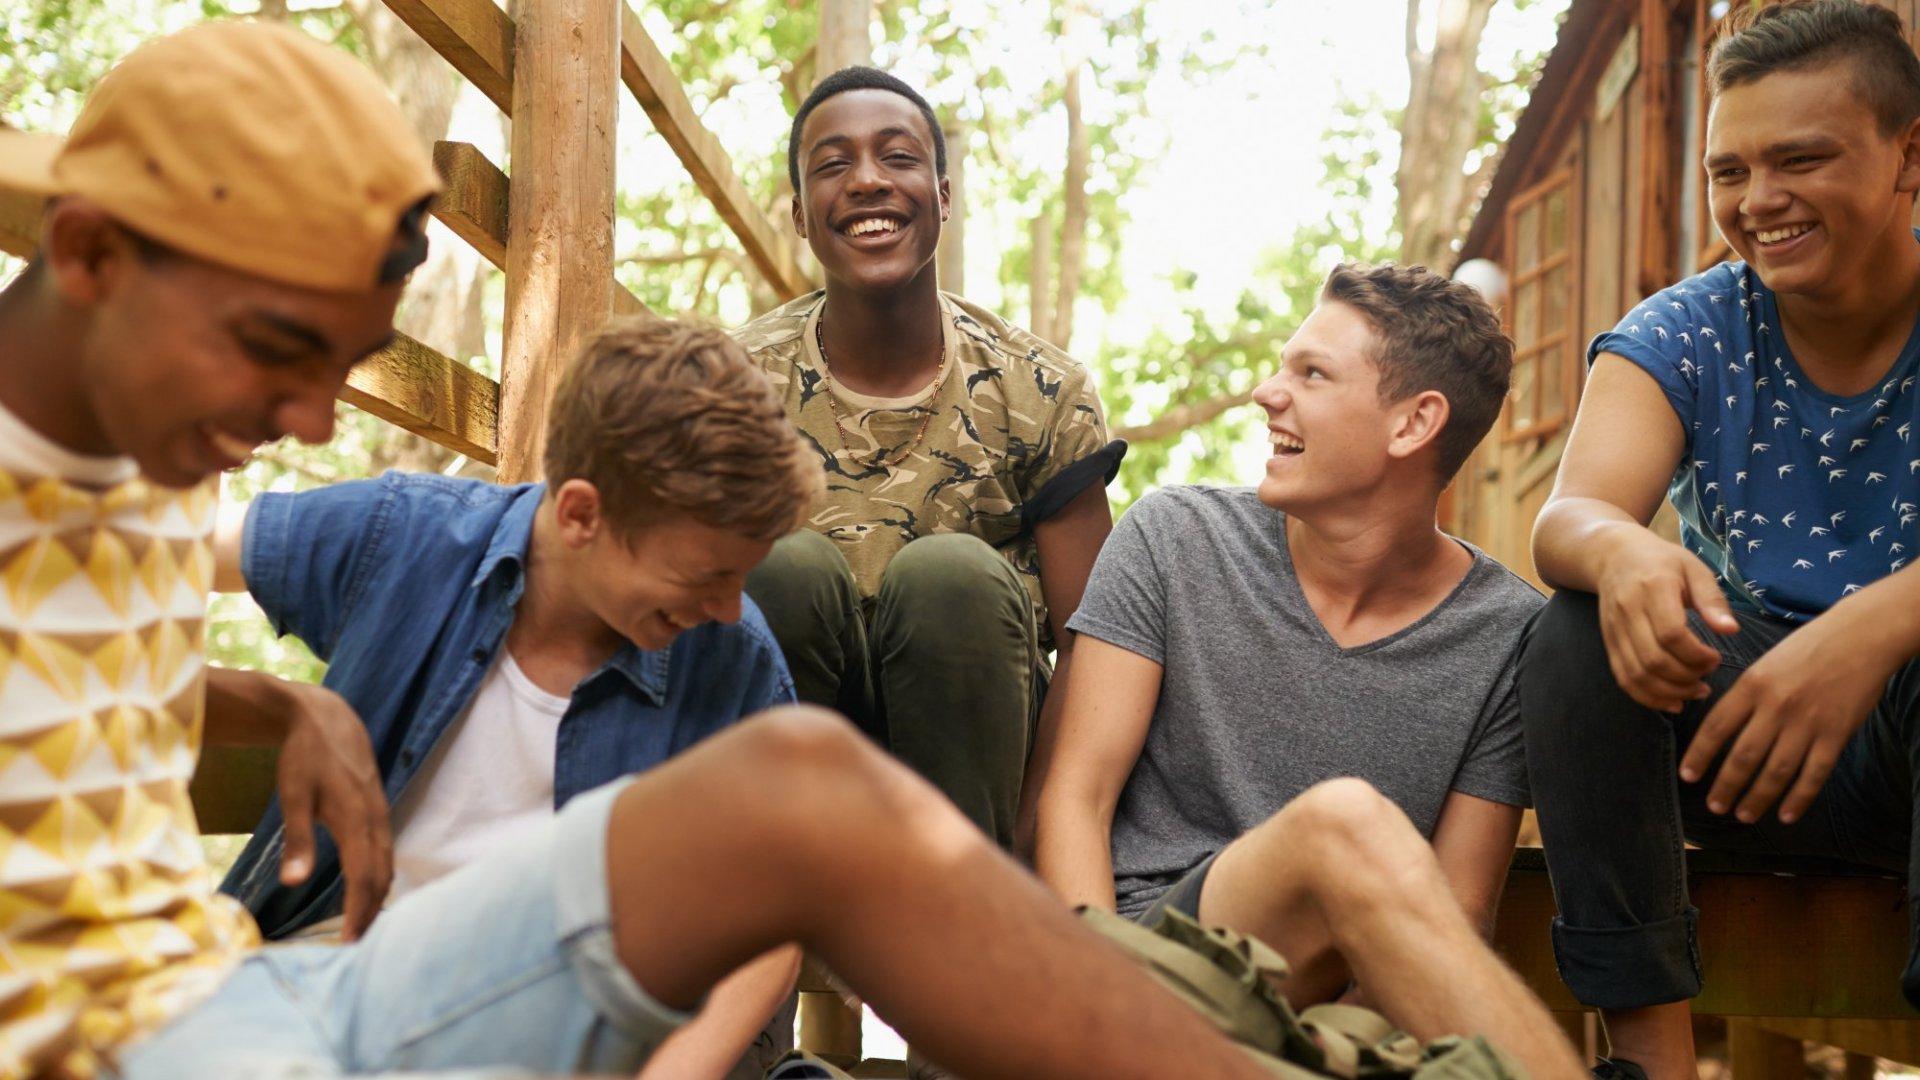 10 Habits That Change Boys Into Men